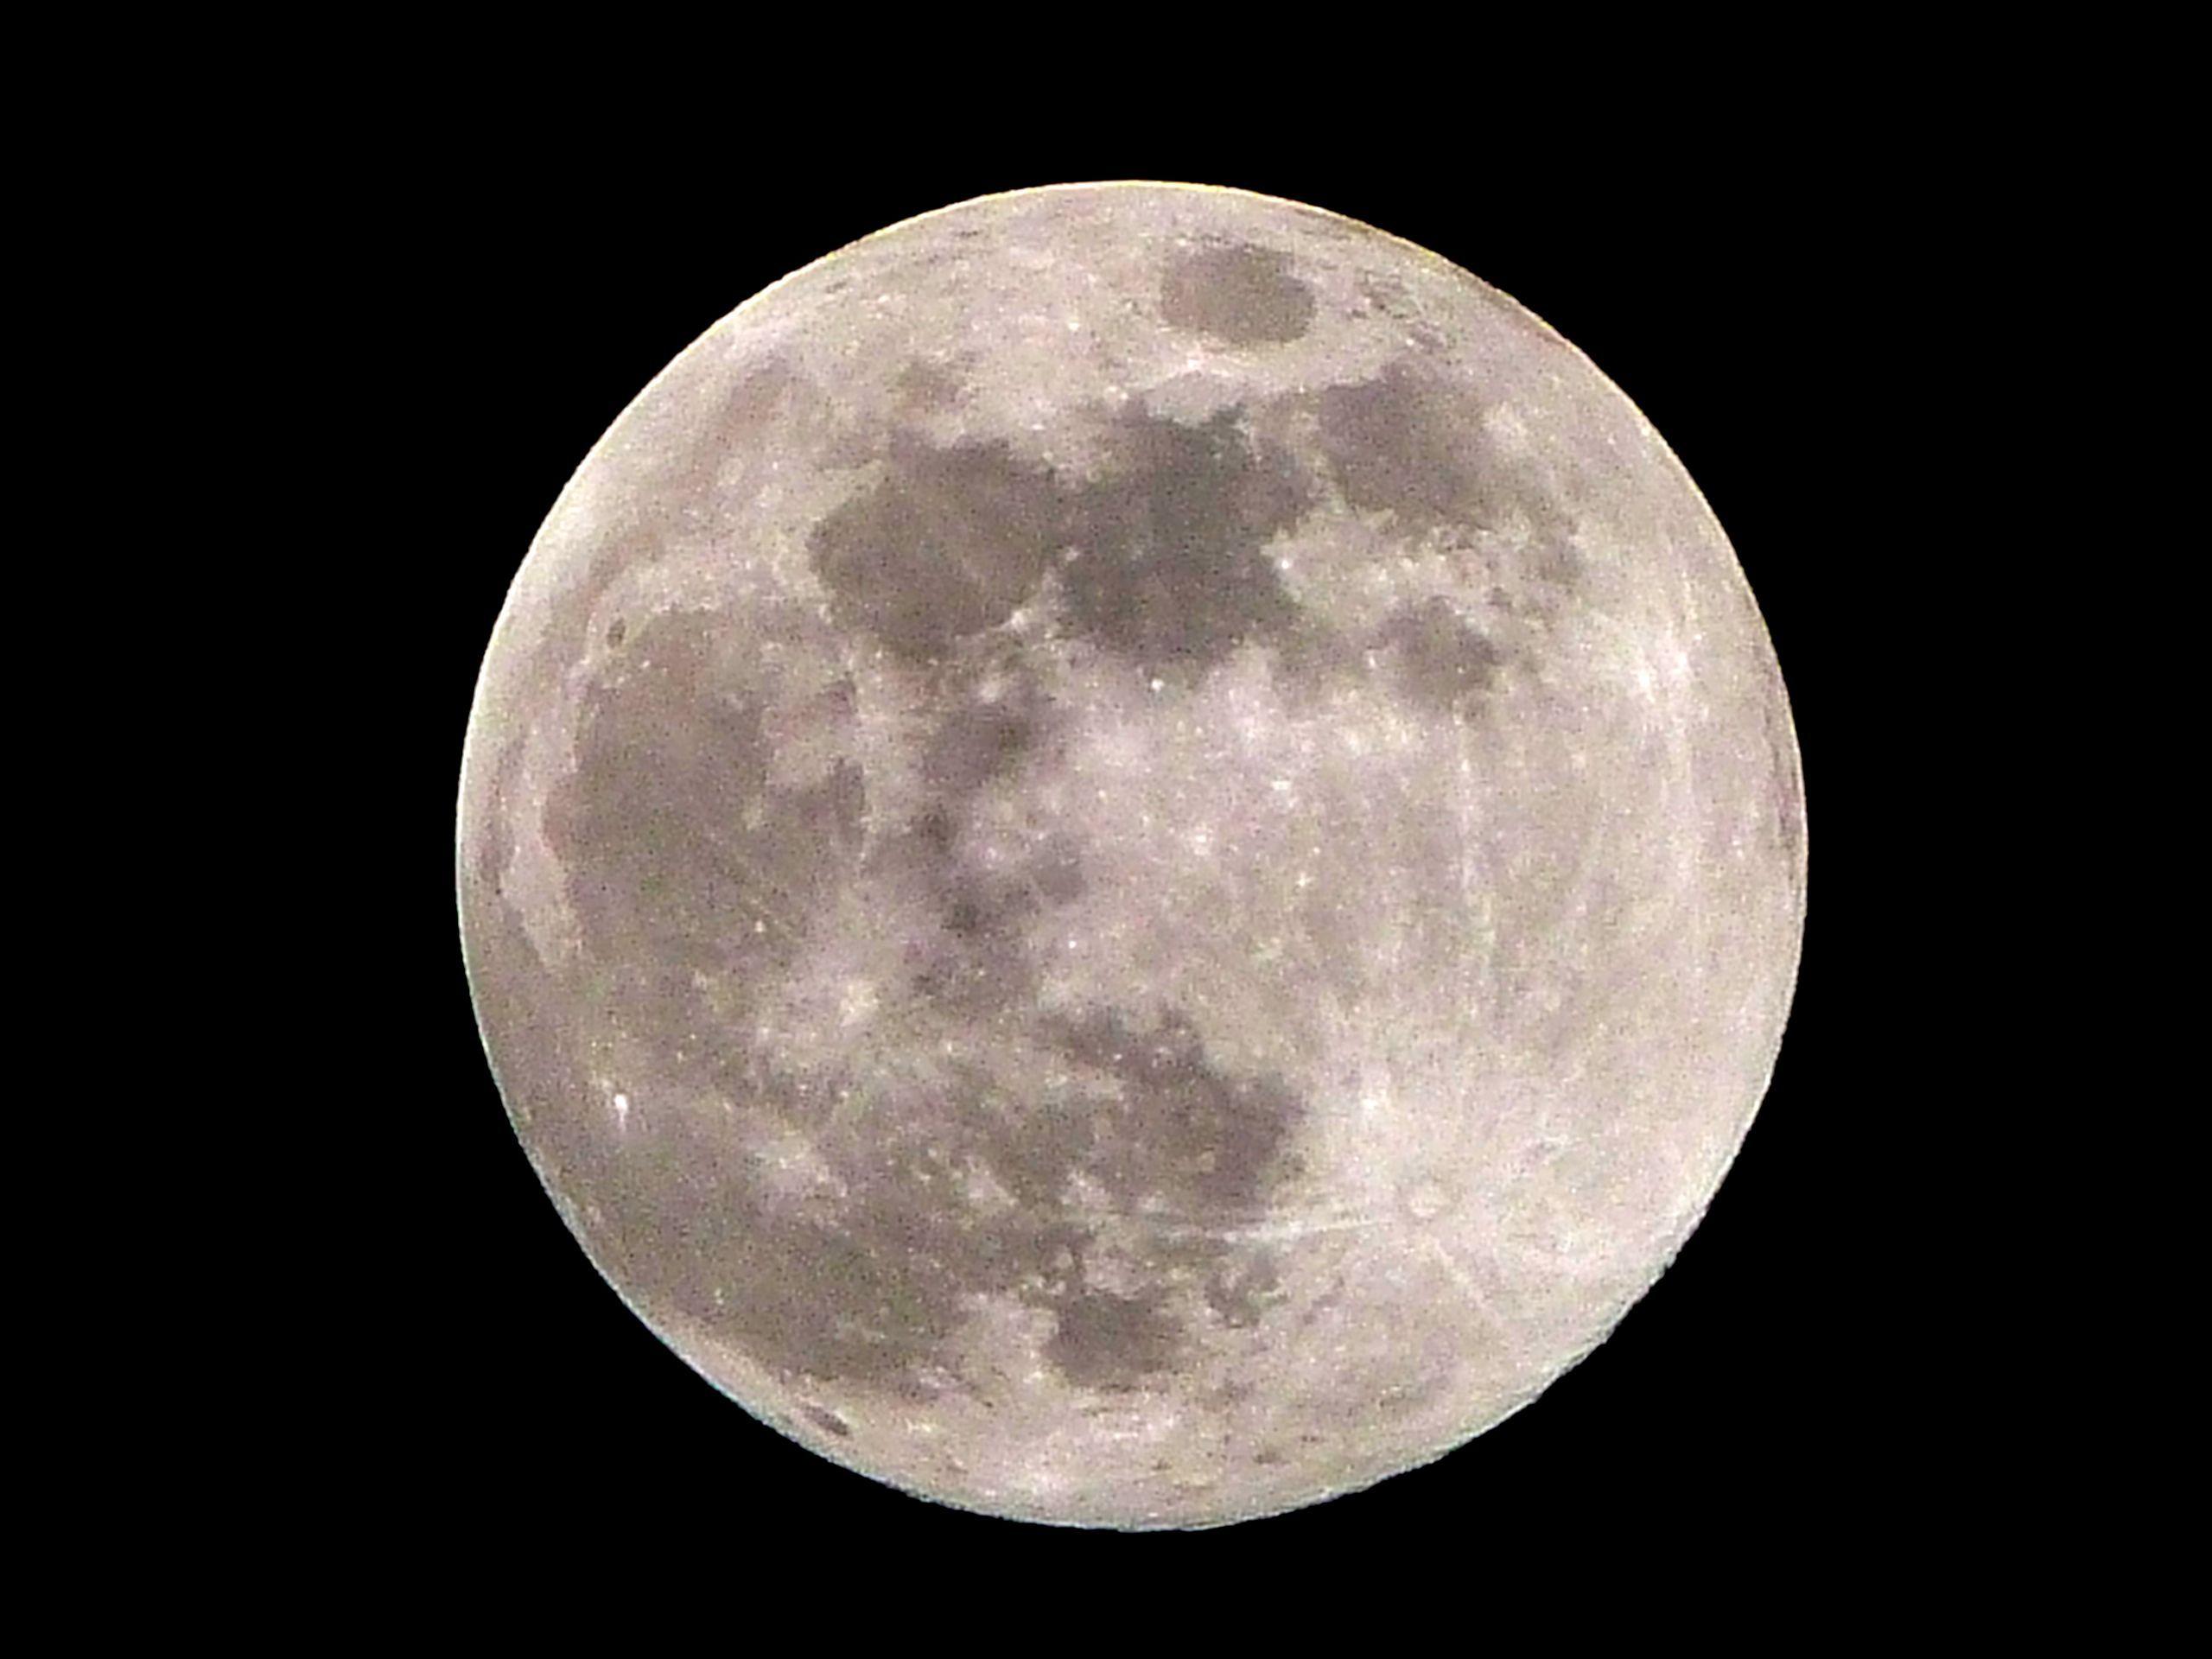 Google Lunar XPrize The Private Moon Race Teams (Images